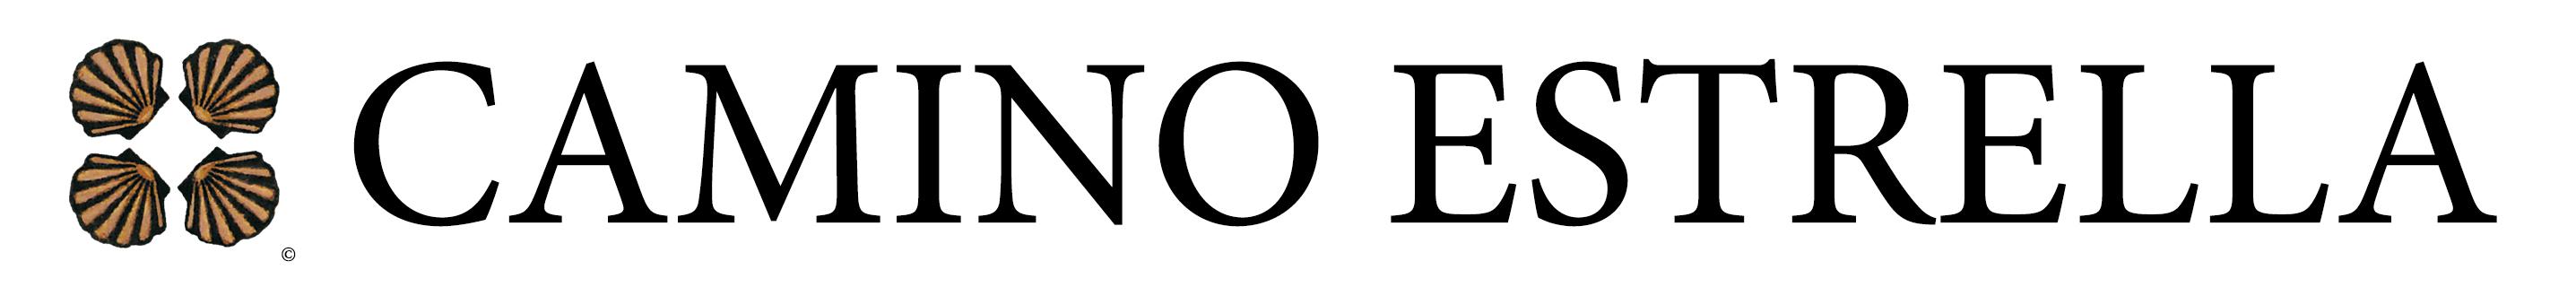 Camino Estrella   logo